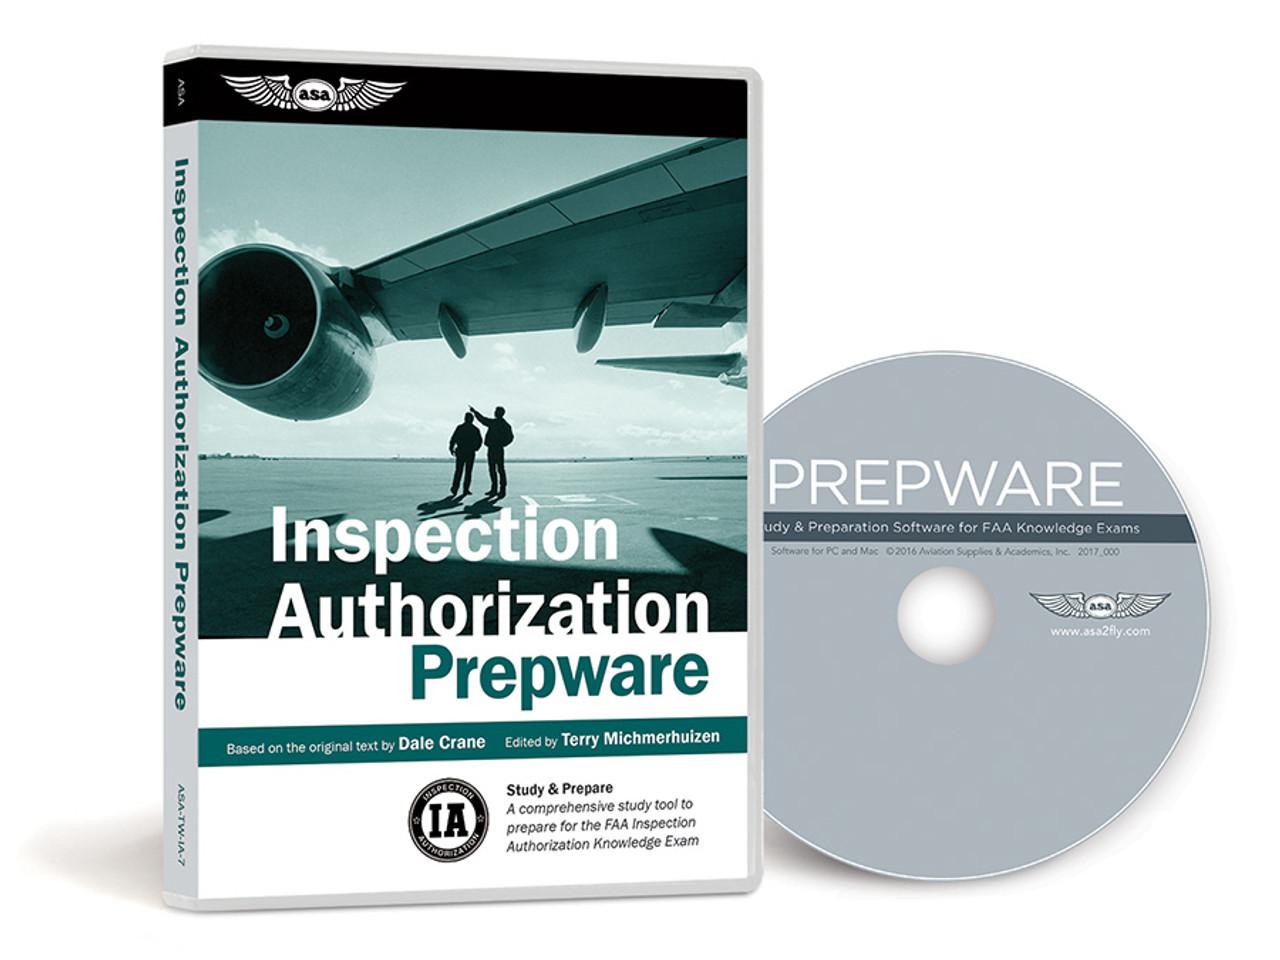 ASA Prepware - Inspection Authorization